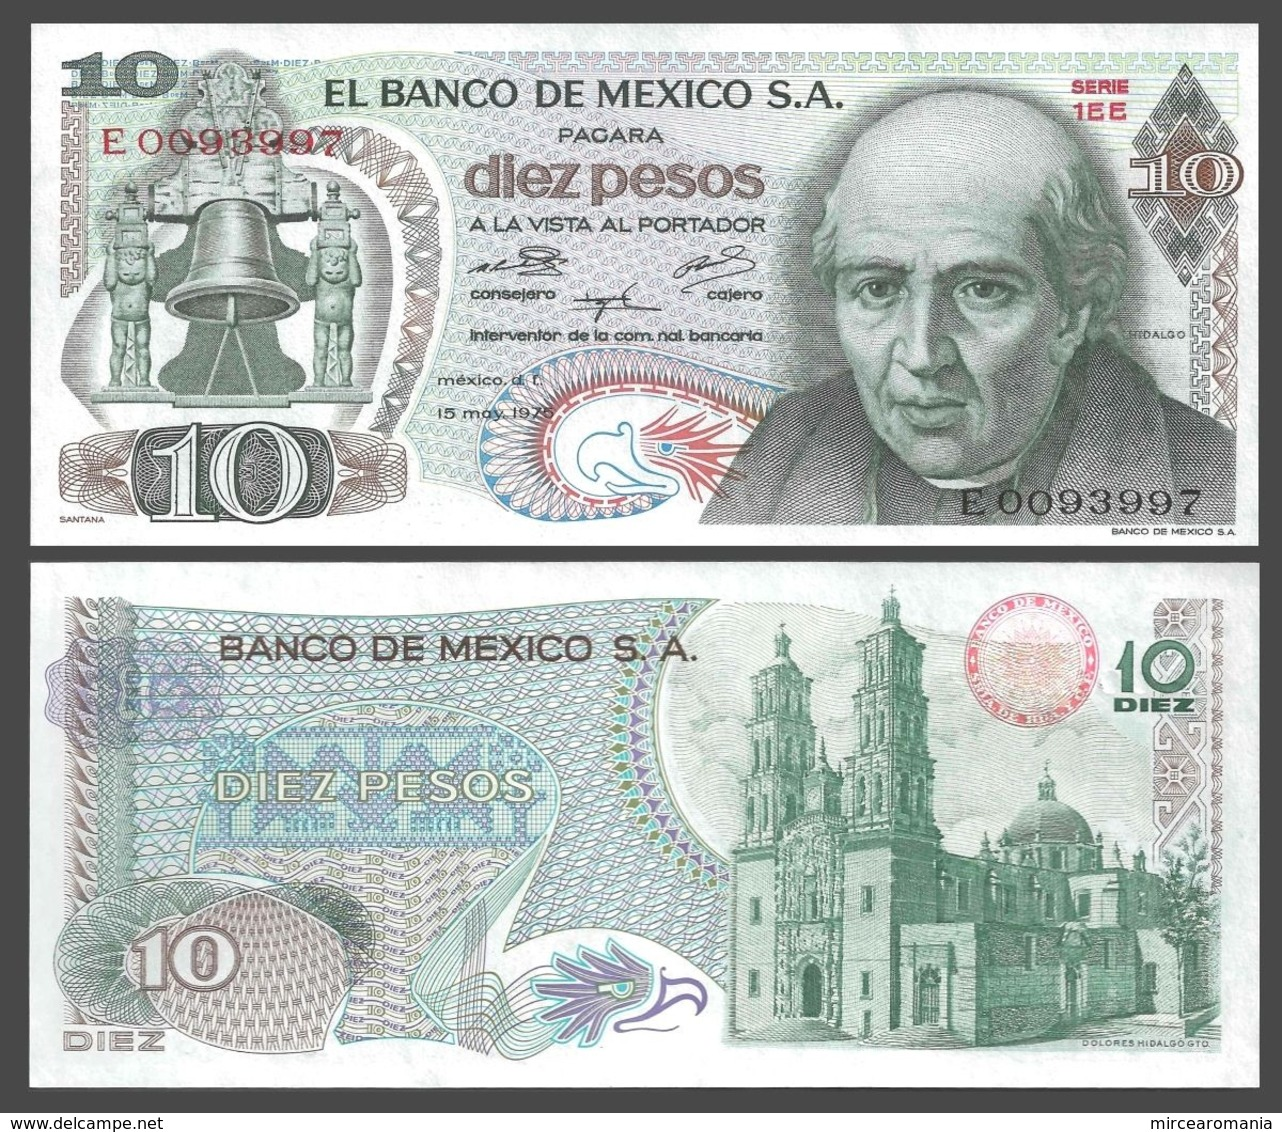 MEXICO - 10 PESOS - 1975 - UNC - Mexico